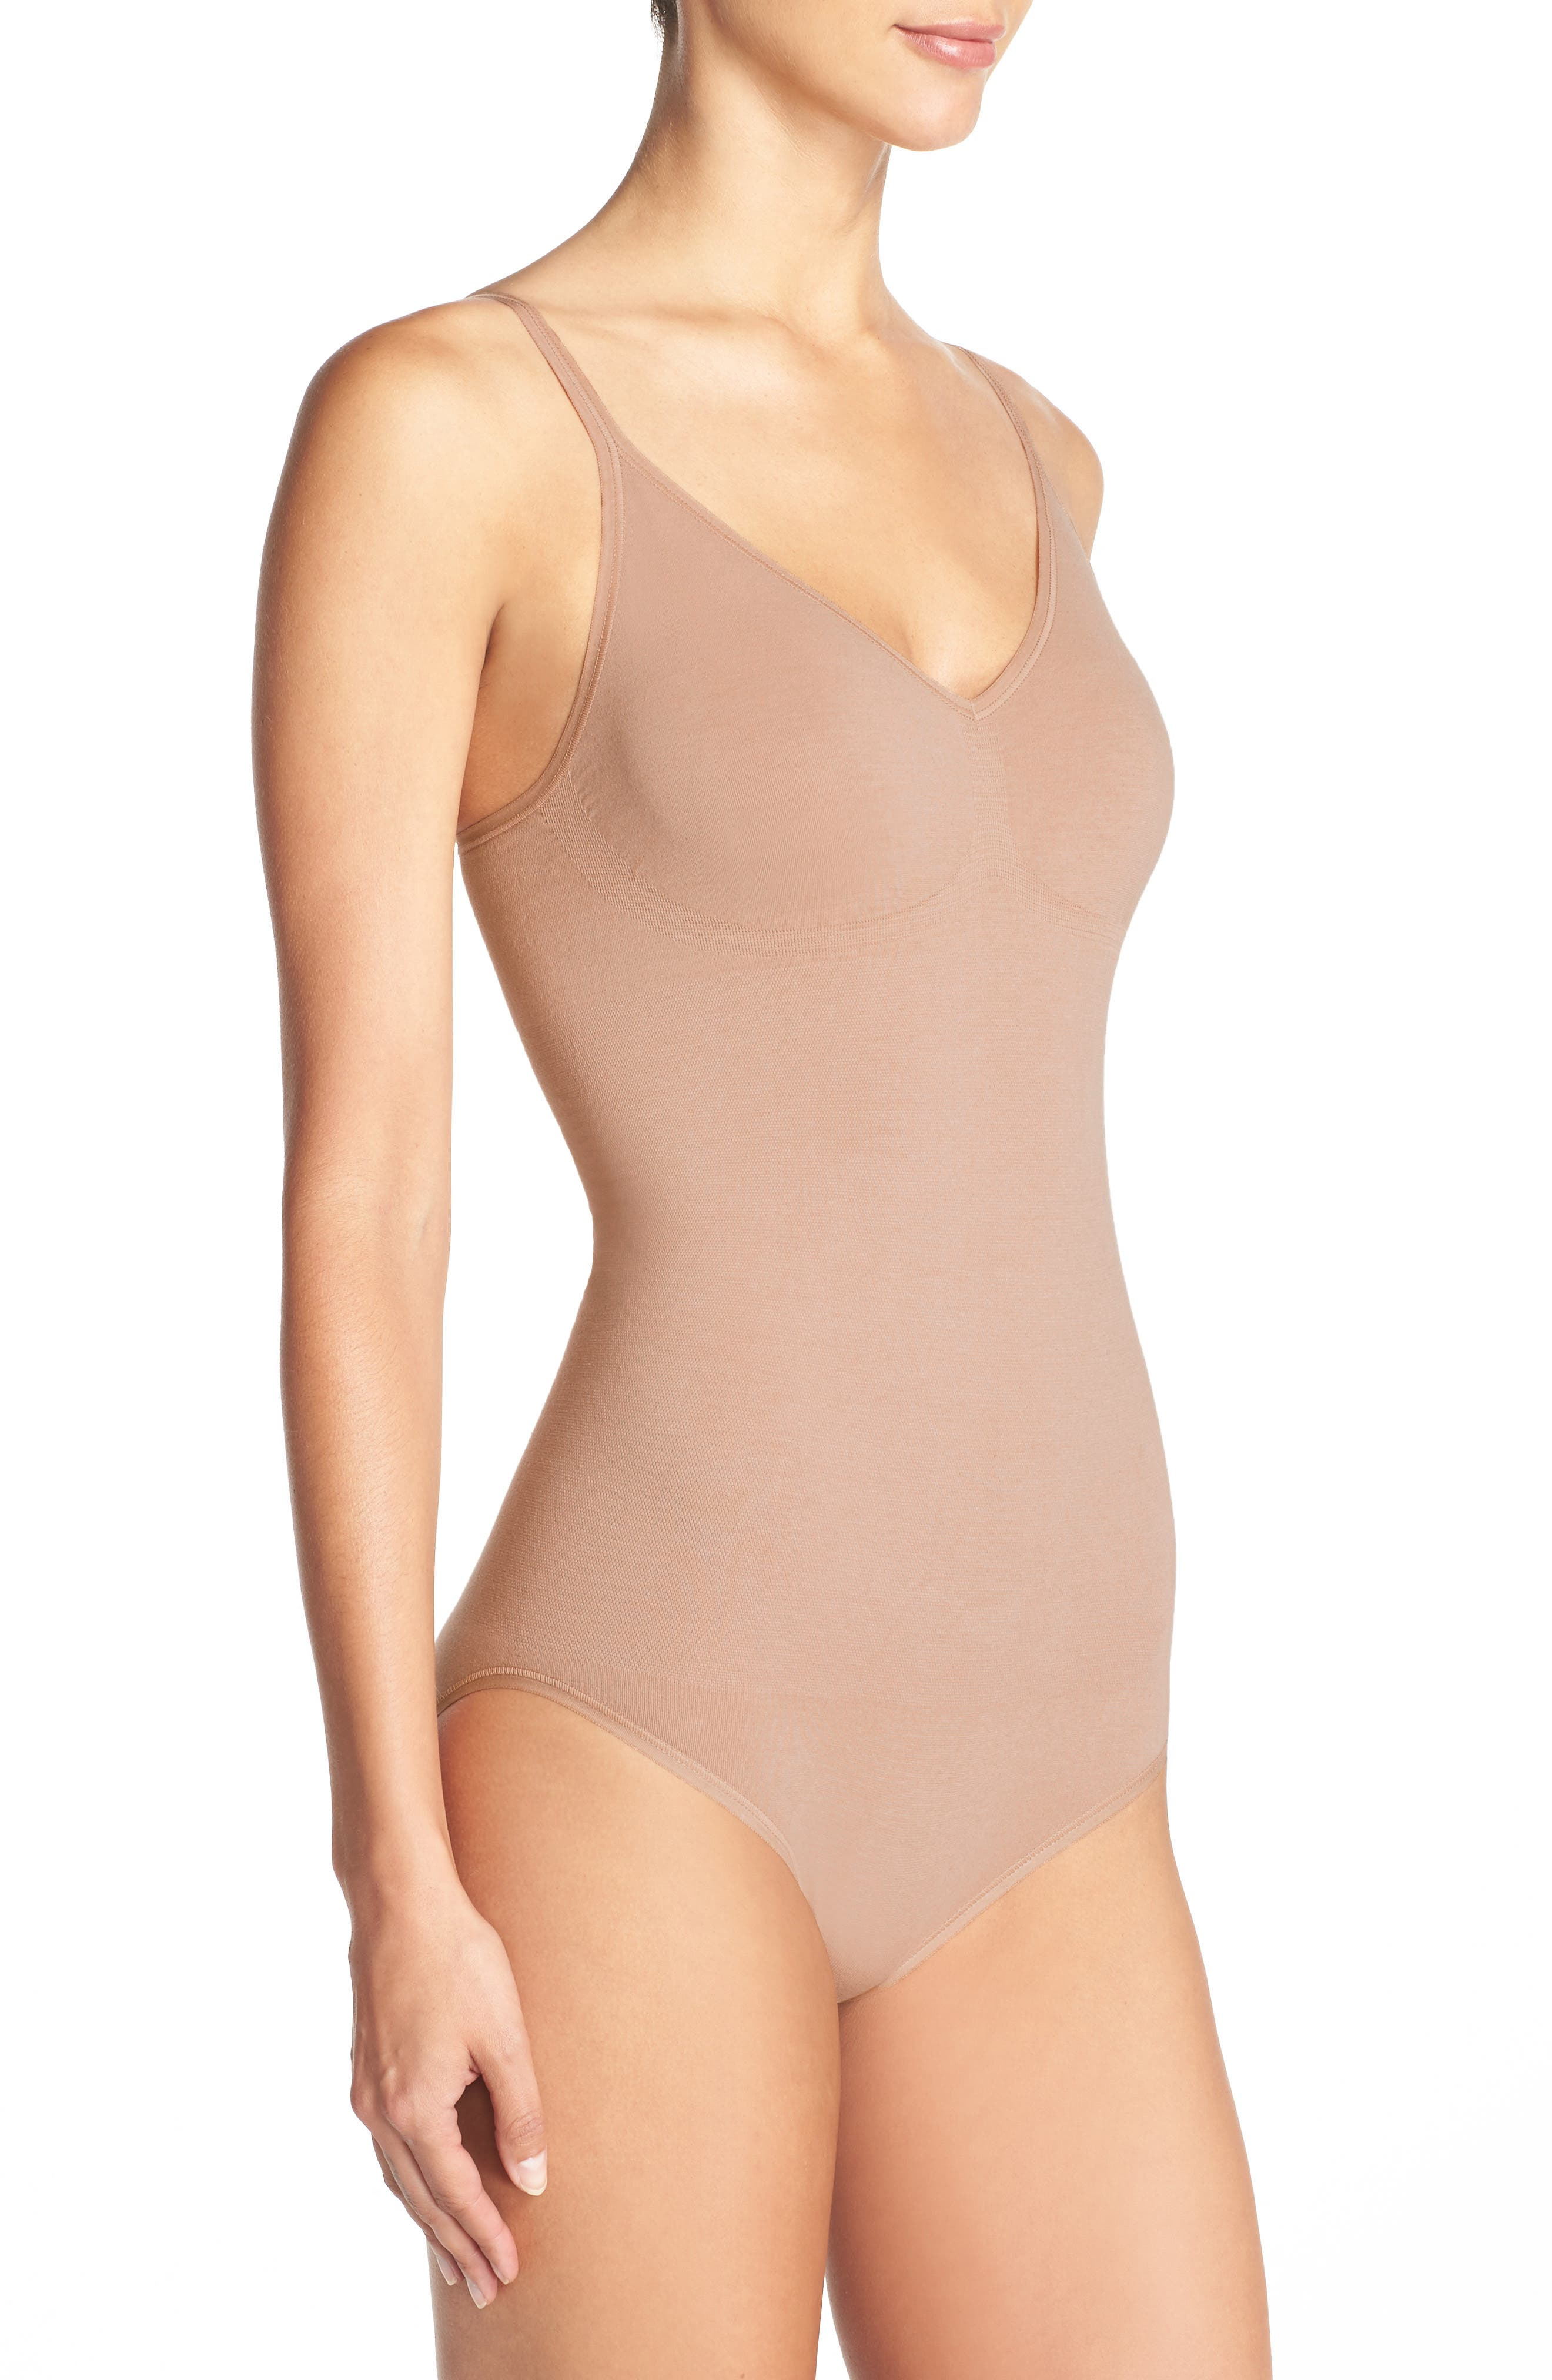 YUMMIE, Conner Convertible Bodysuit, Alternate thumbnail 4, color, 200